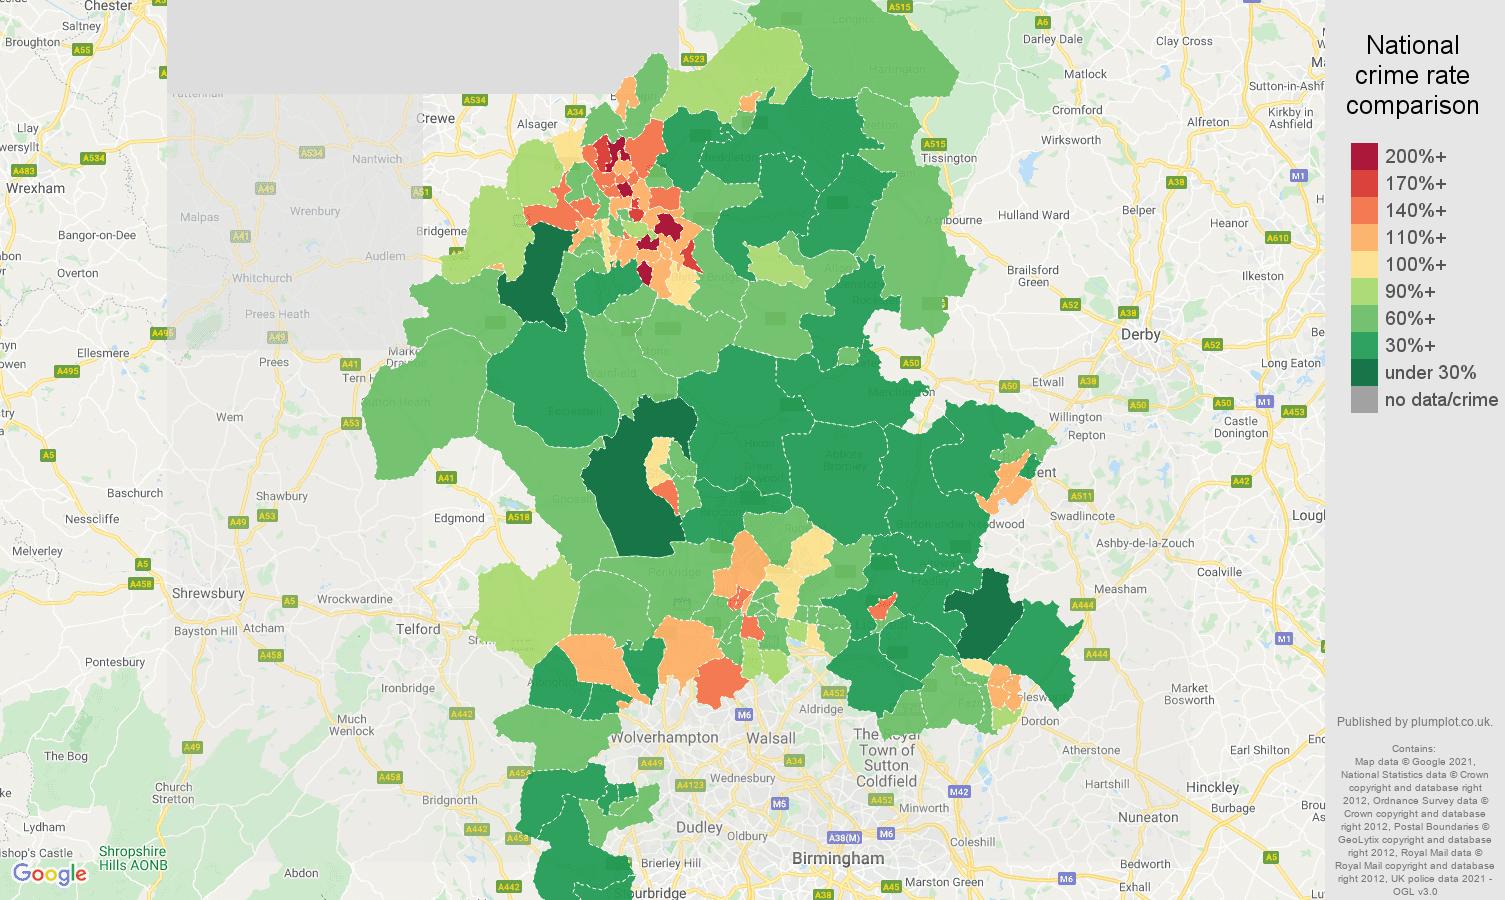 Staffordshire violent crime rate comparison map